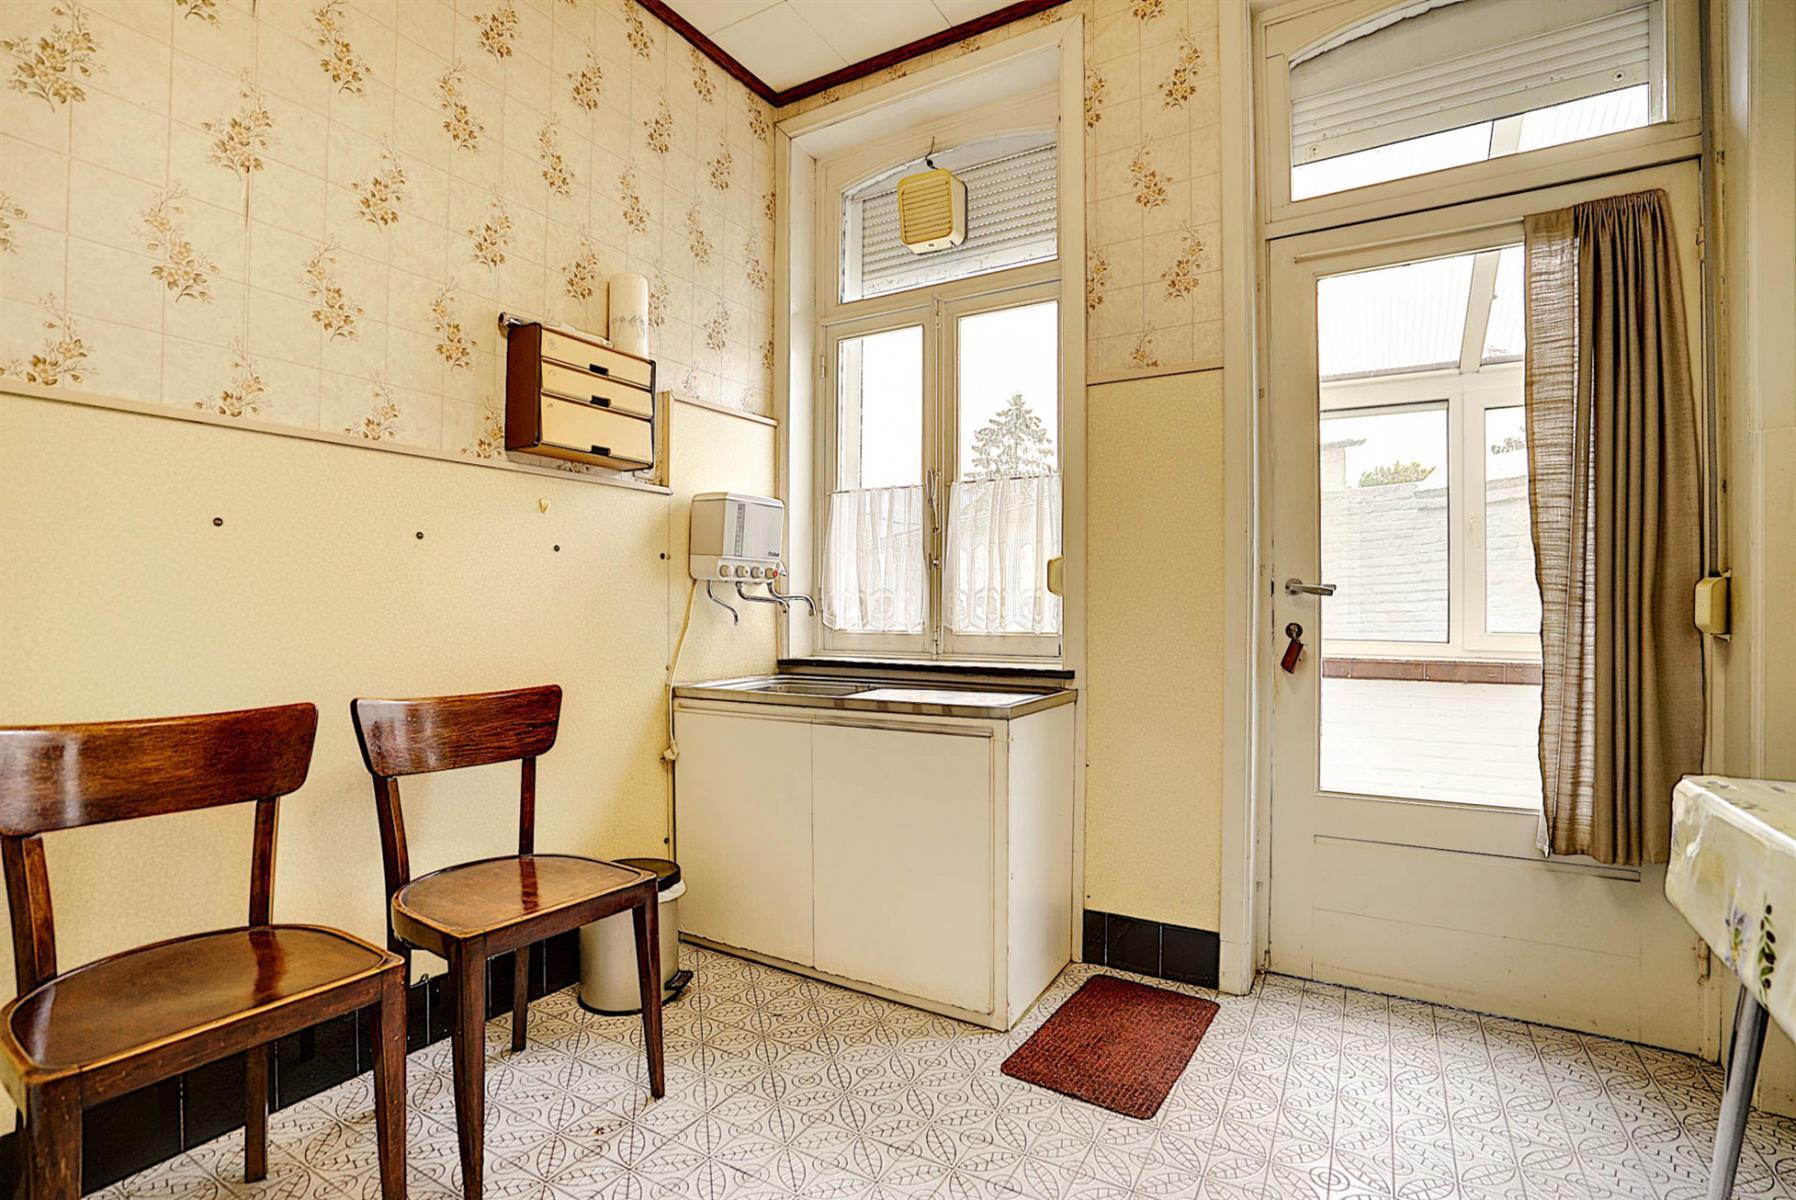 Maison - Hévillers - #4168667-8